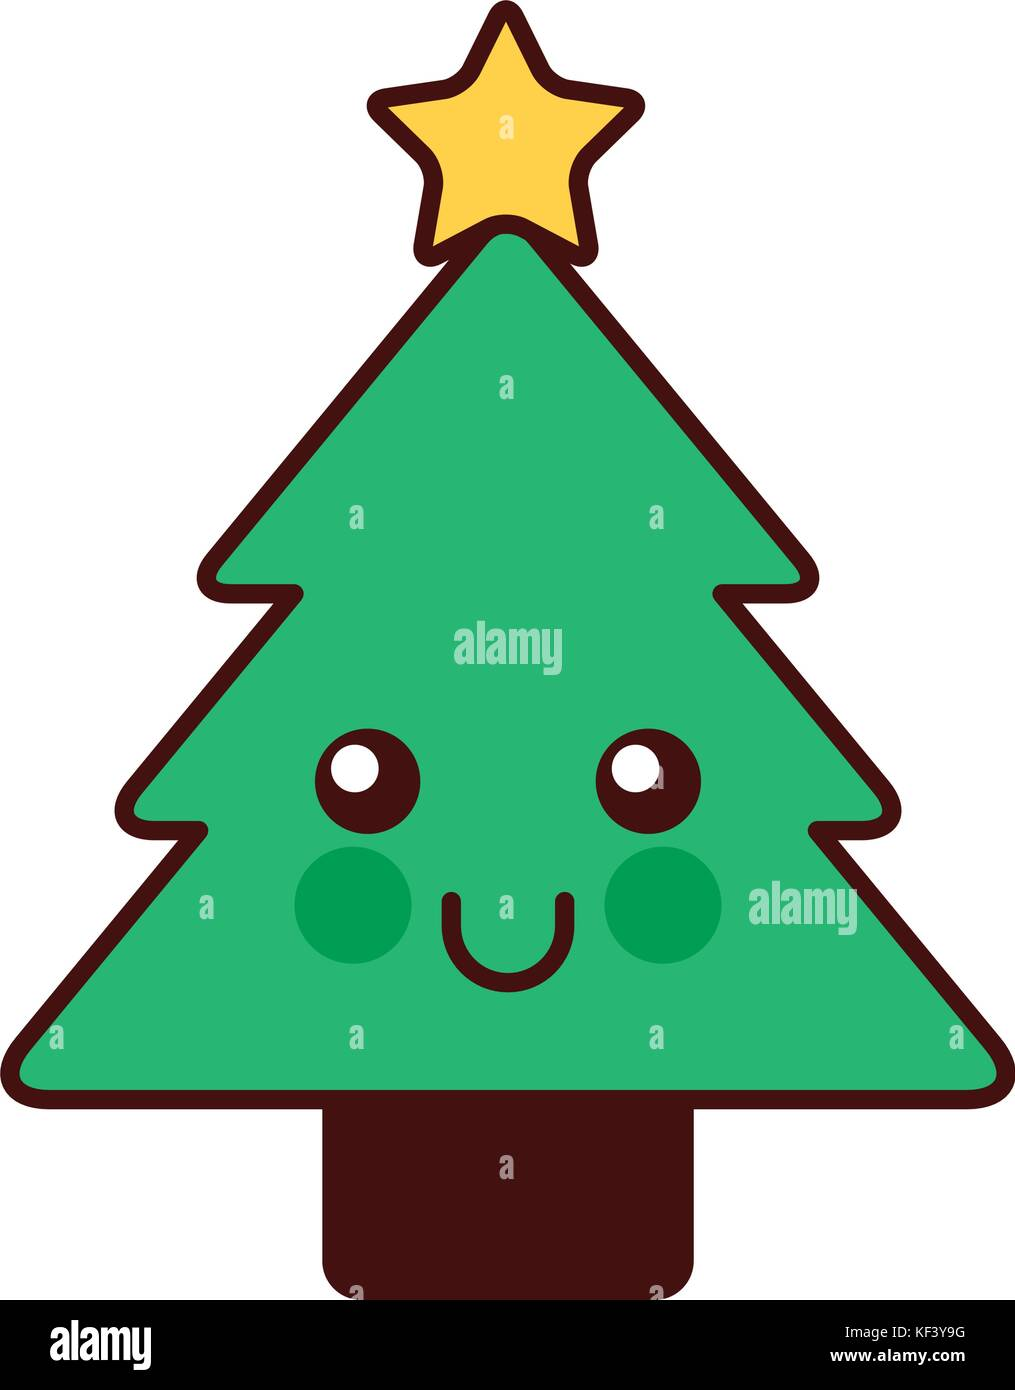 Immagini Natalizie Kawaii.Albero Di Natale Cartoon Albero Di Natale Dorato Ipasvialessandria